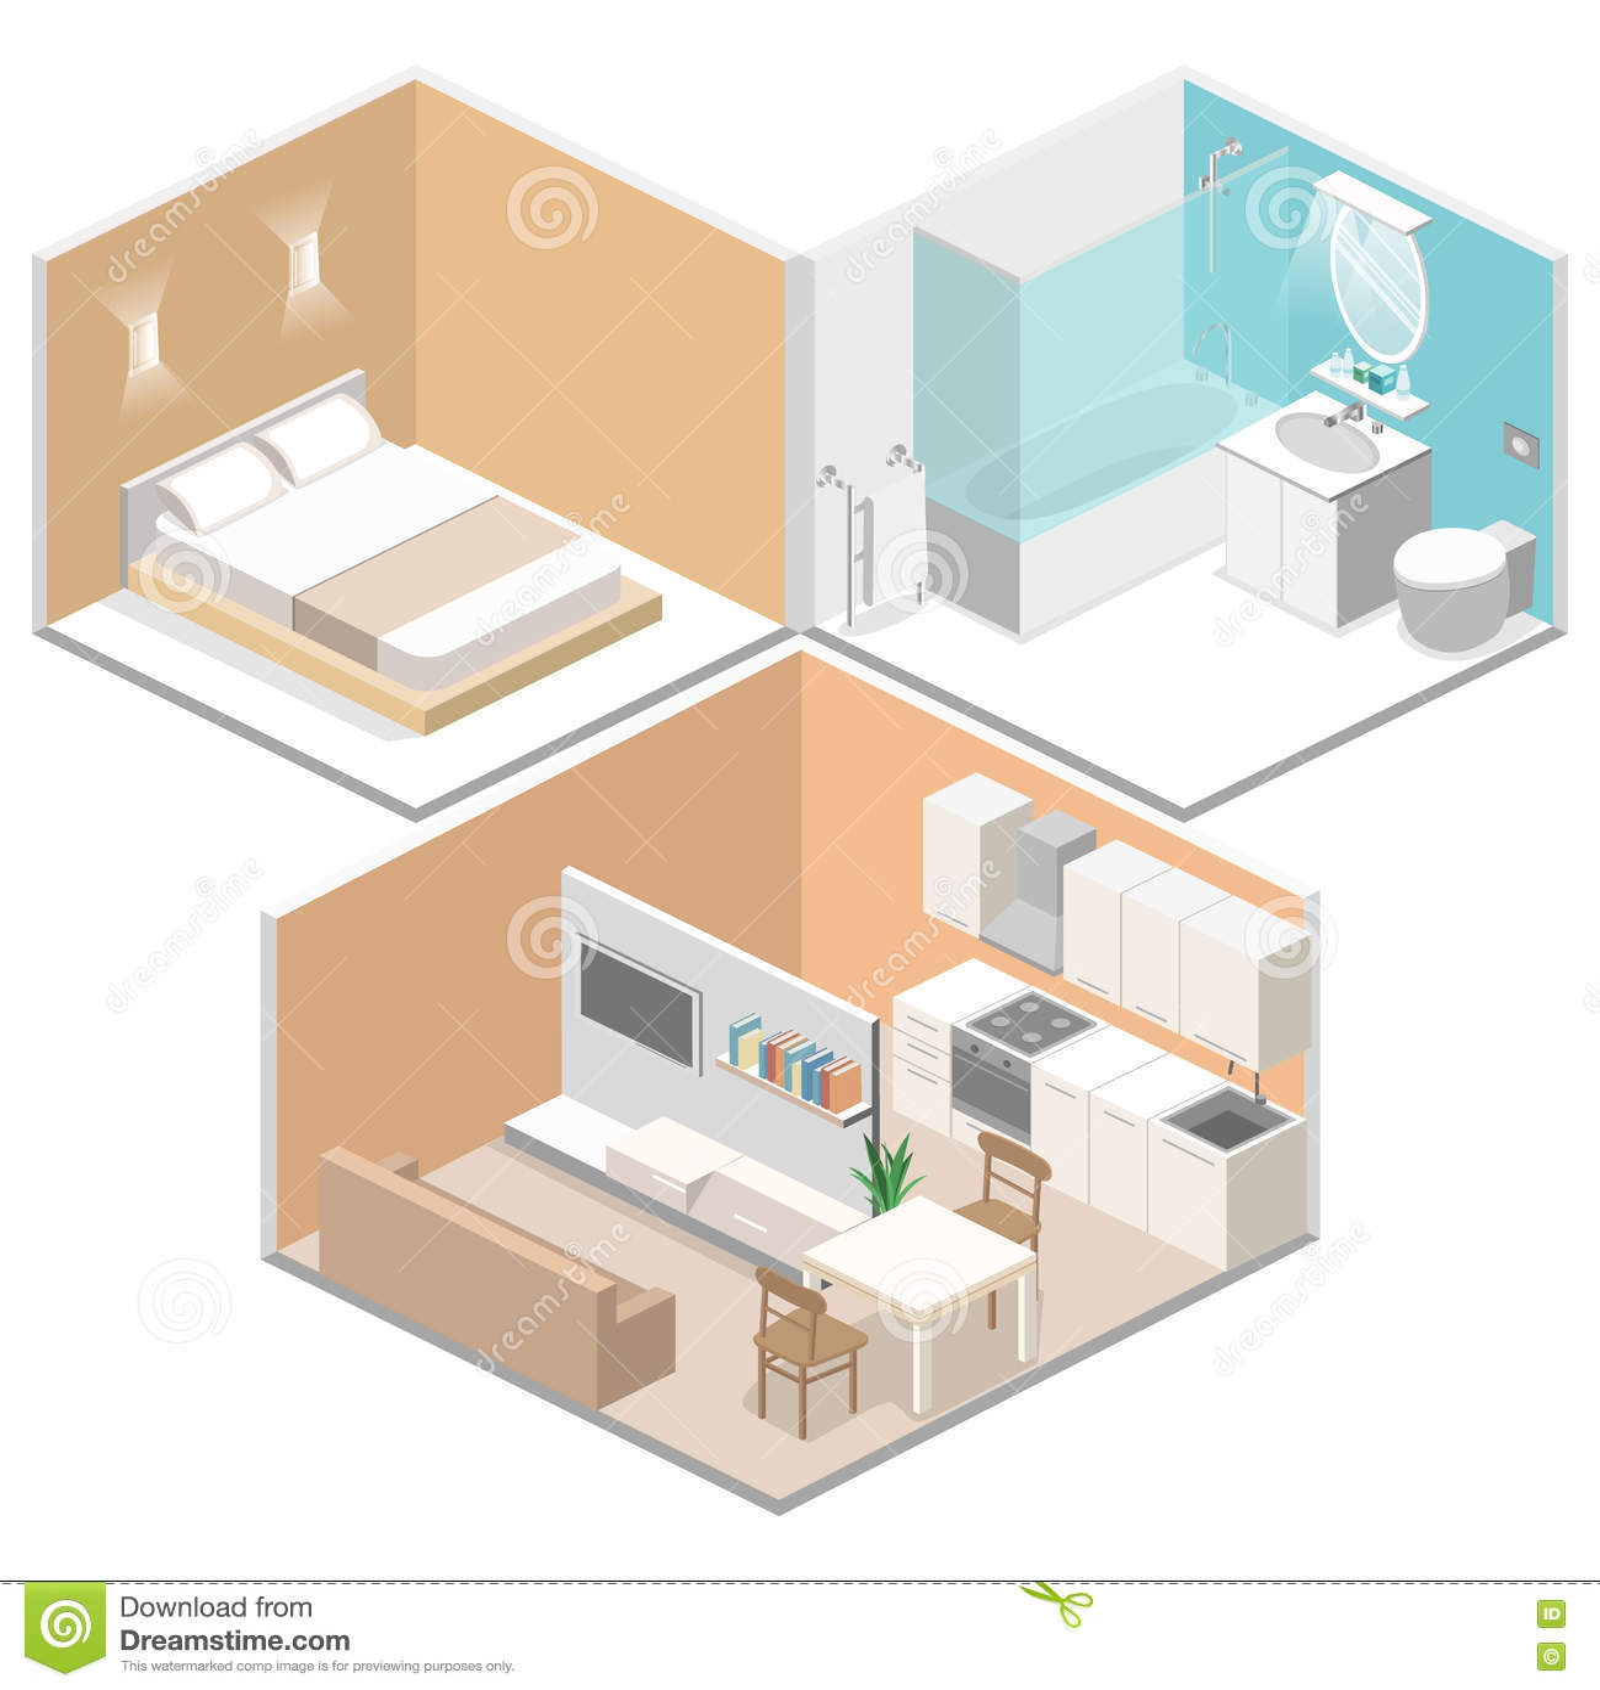 Isometric flat 3d interior kitchen bathroom living room - Living room bedroom bathroom kitchen ...